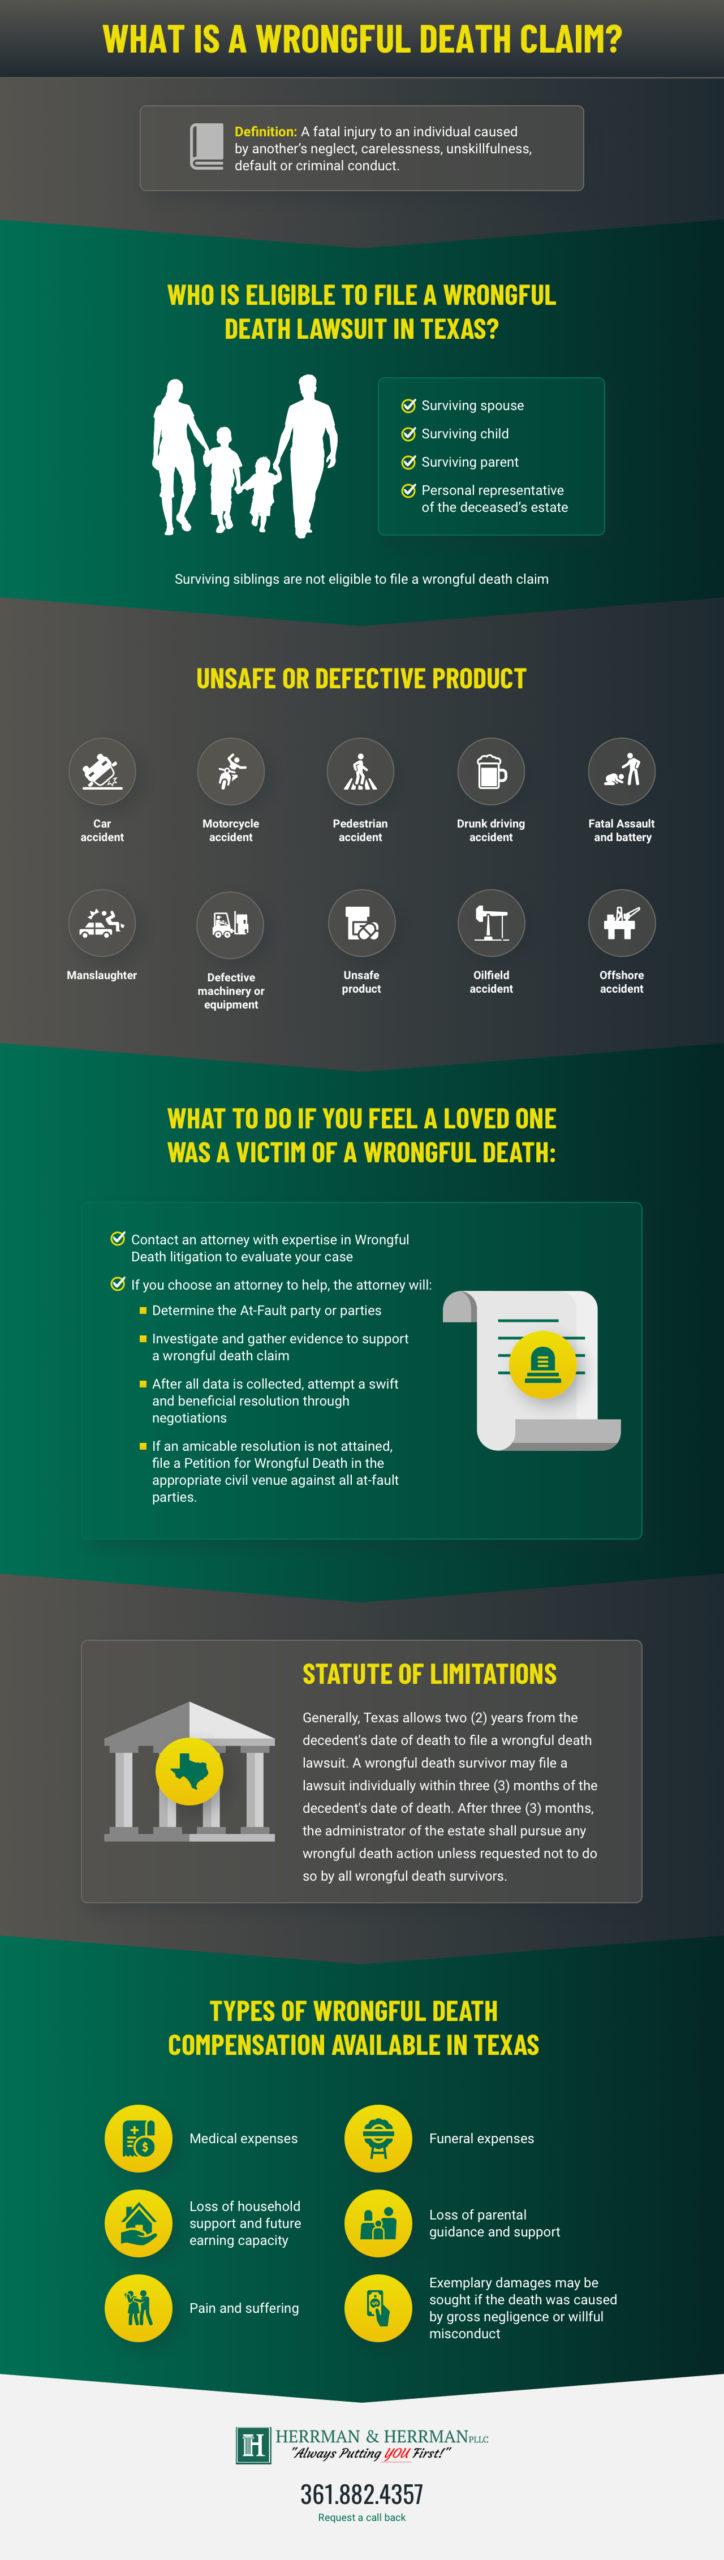 Wrongful Death Lawyer